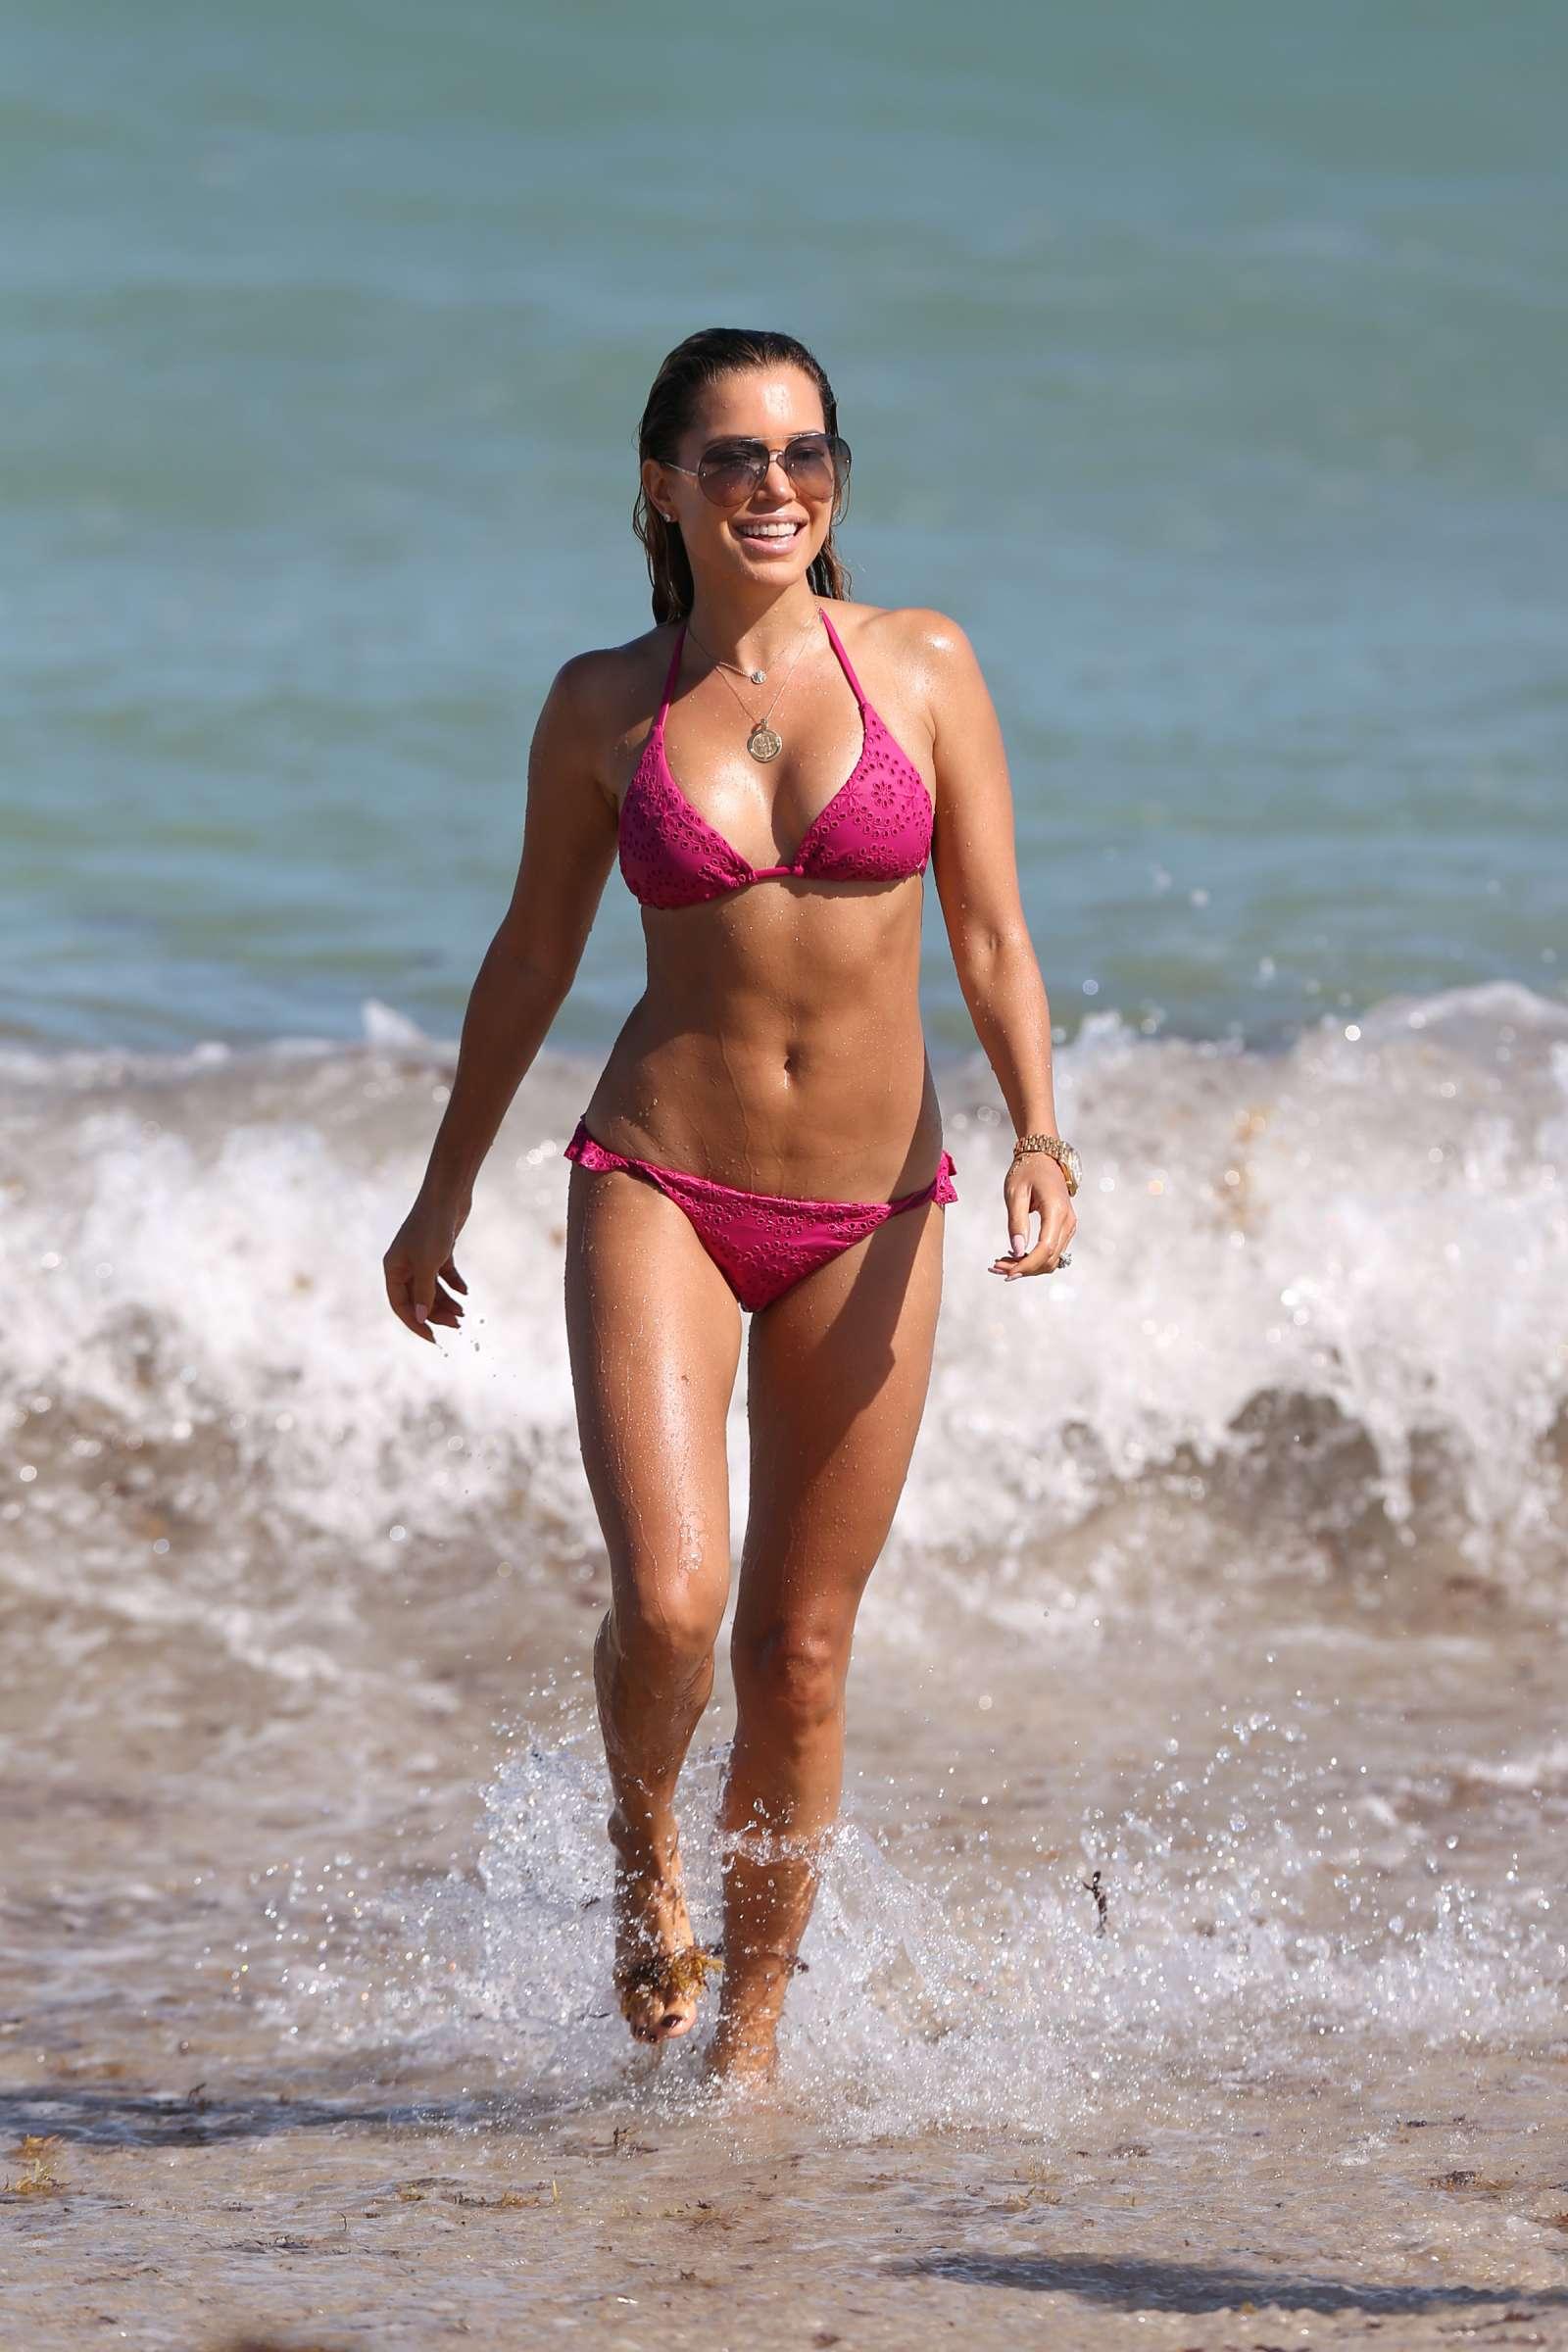 Sylvie Meis 2018 : Sylvie Meis in Pink Bikini 2018 -19